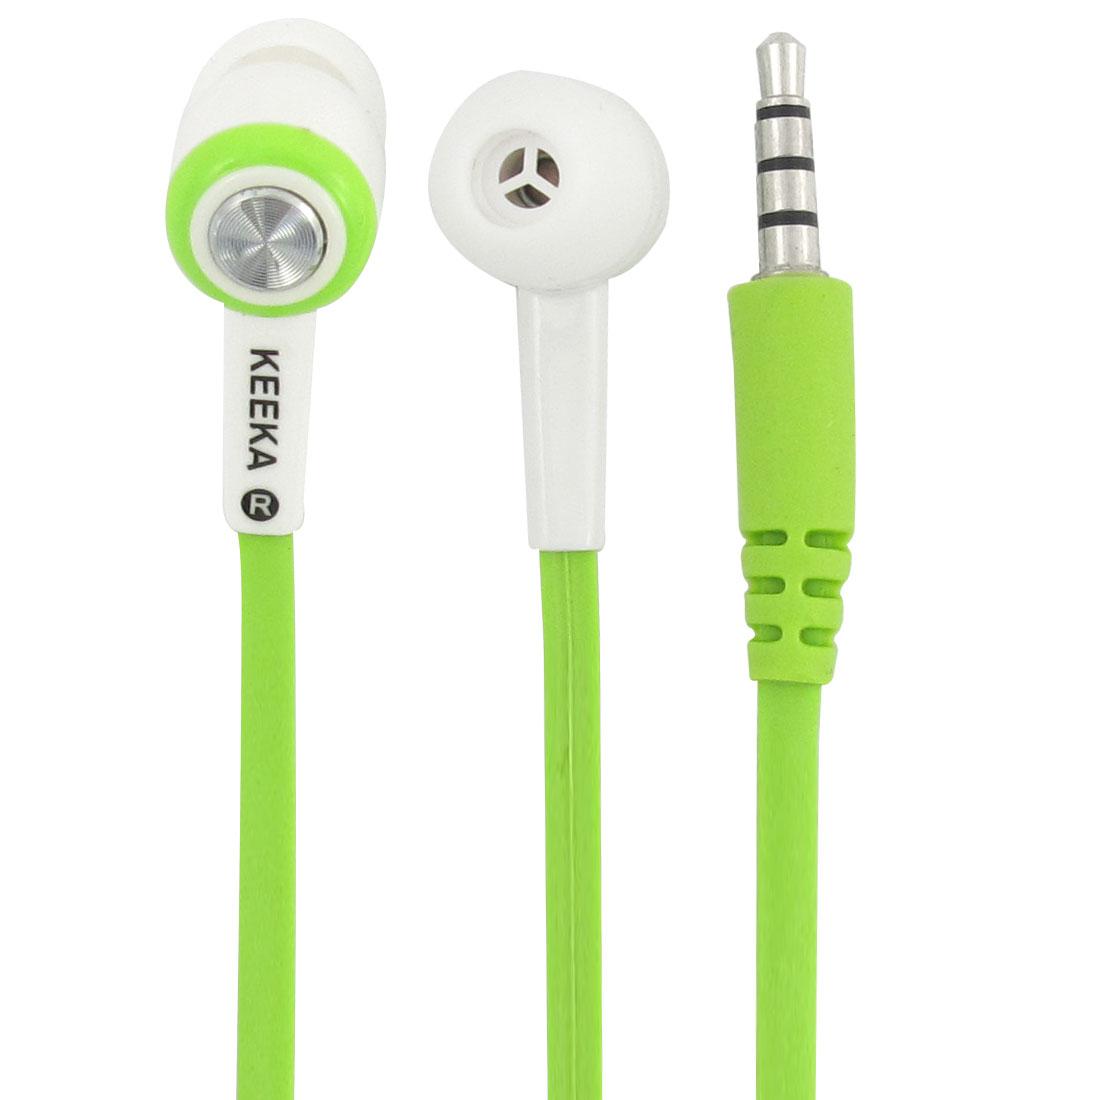 Authorized KEEKA White 3.5mm Stereo In Ear Earphone w Mic Green